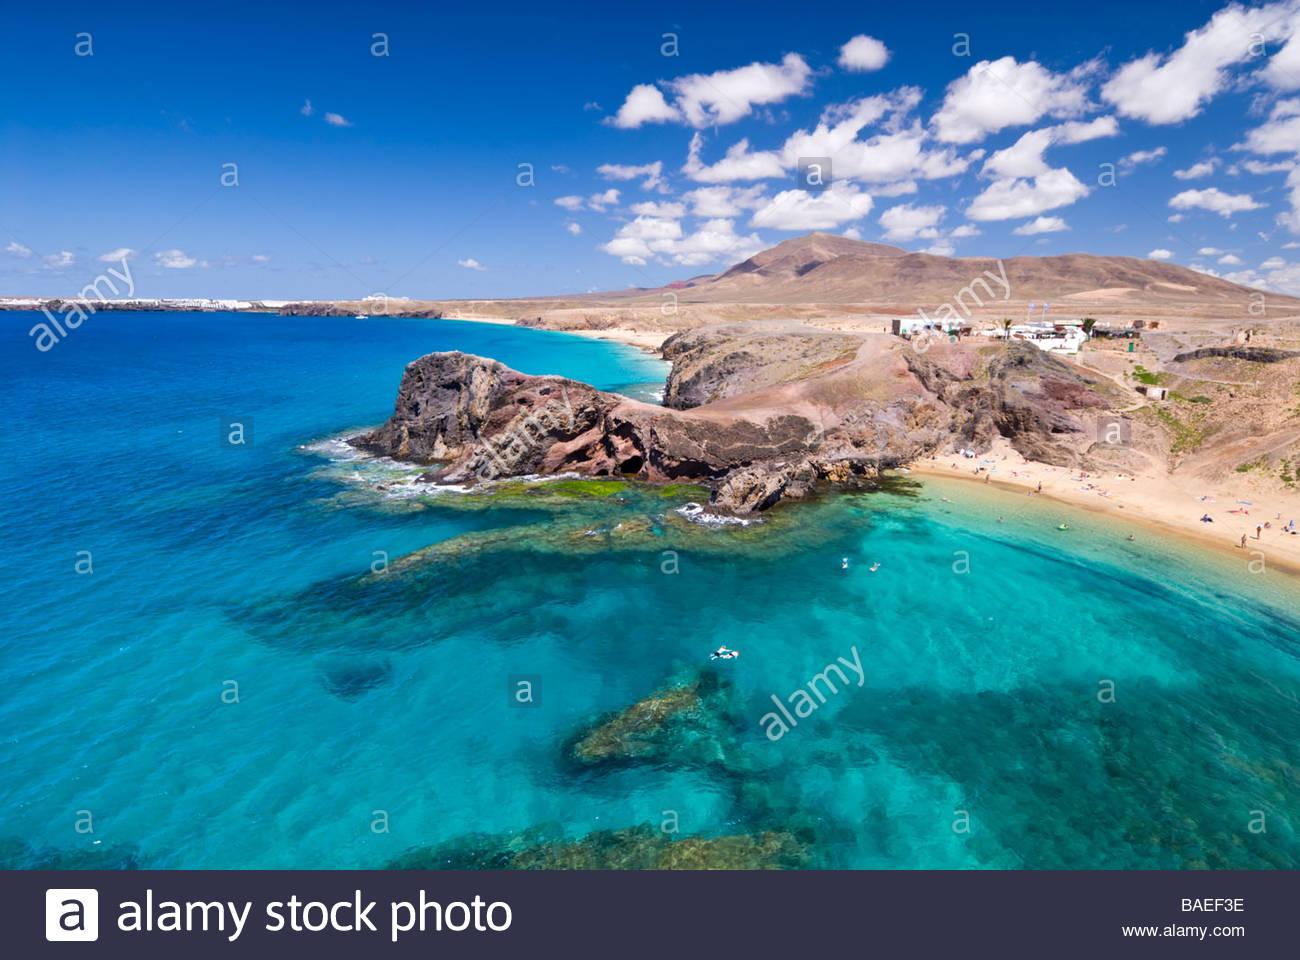 Playa de Papagayo, Lanzarote, Kanarische Inseln, Spanien. Stockbild